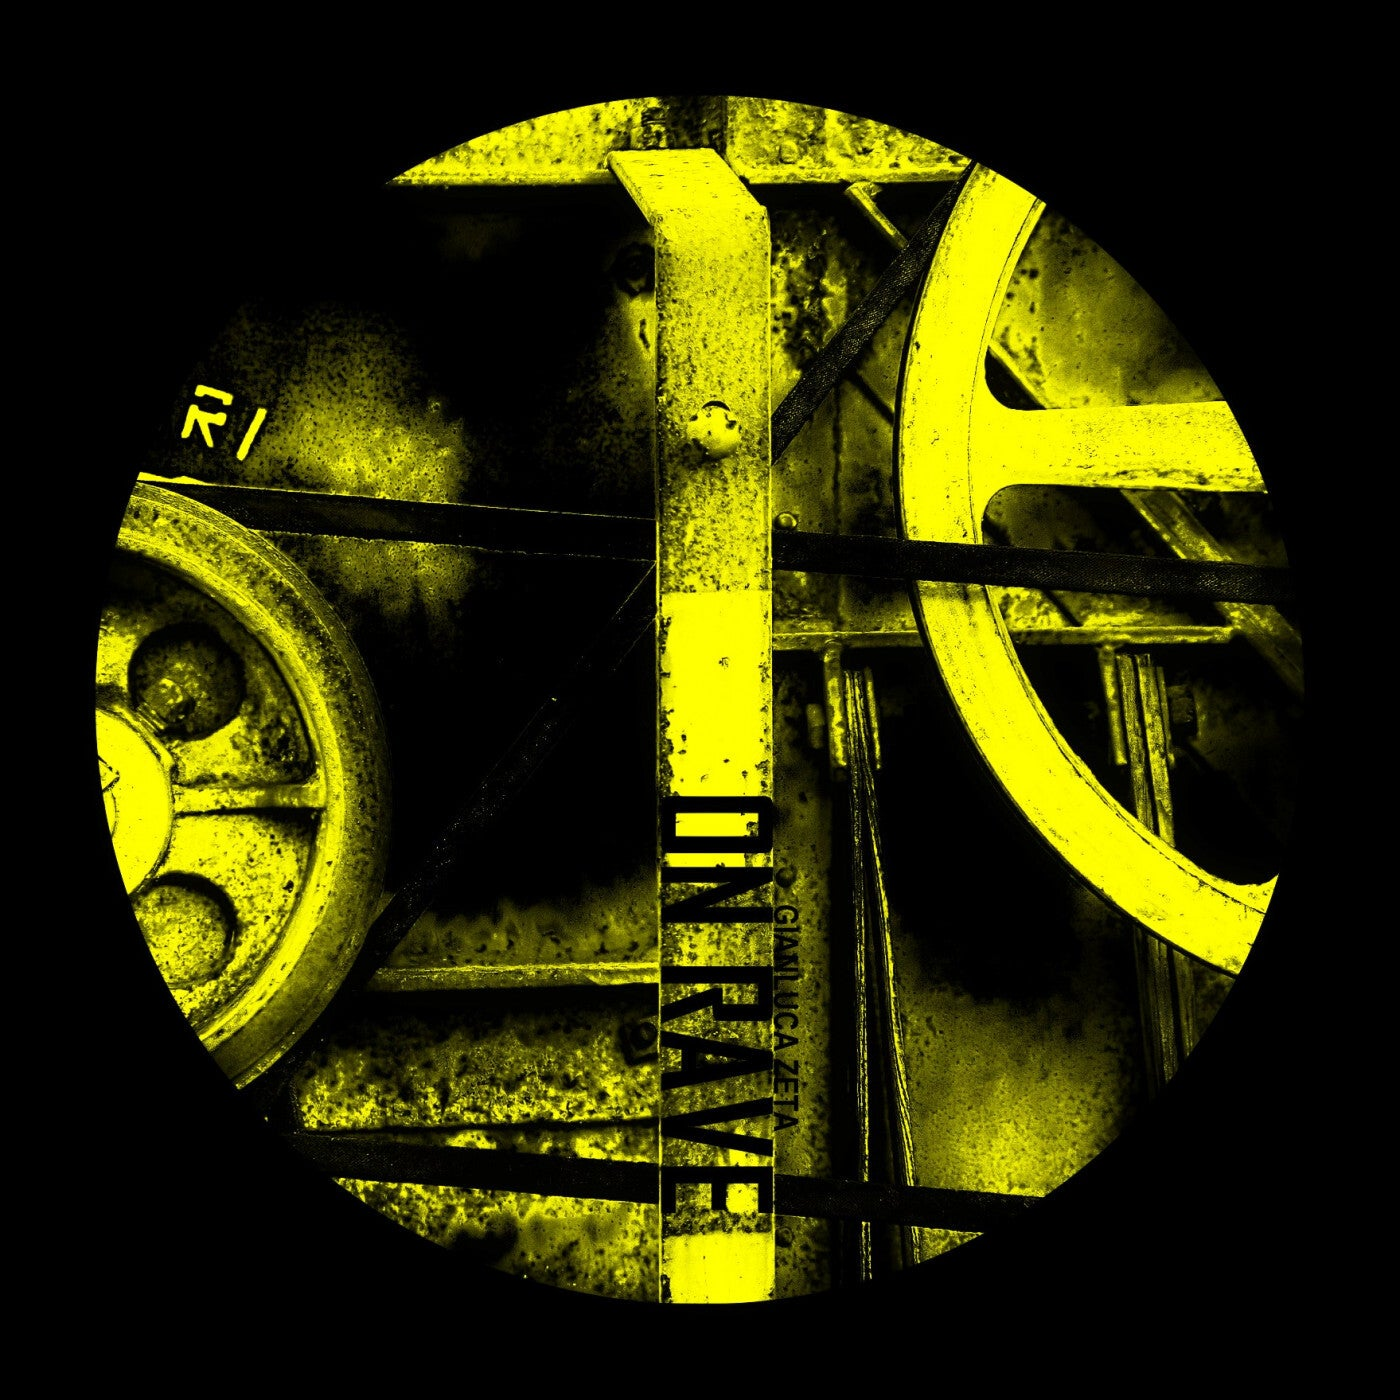 On Rave (Steve Soprani, Dandi & Ugo Remix)